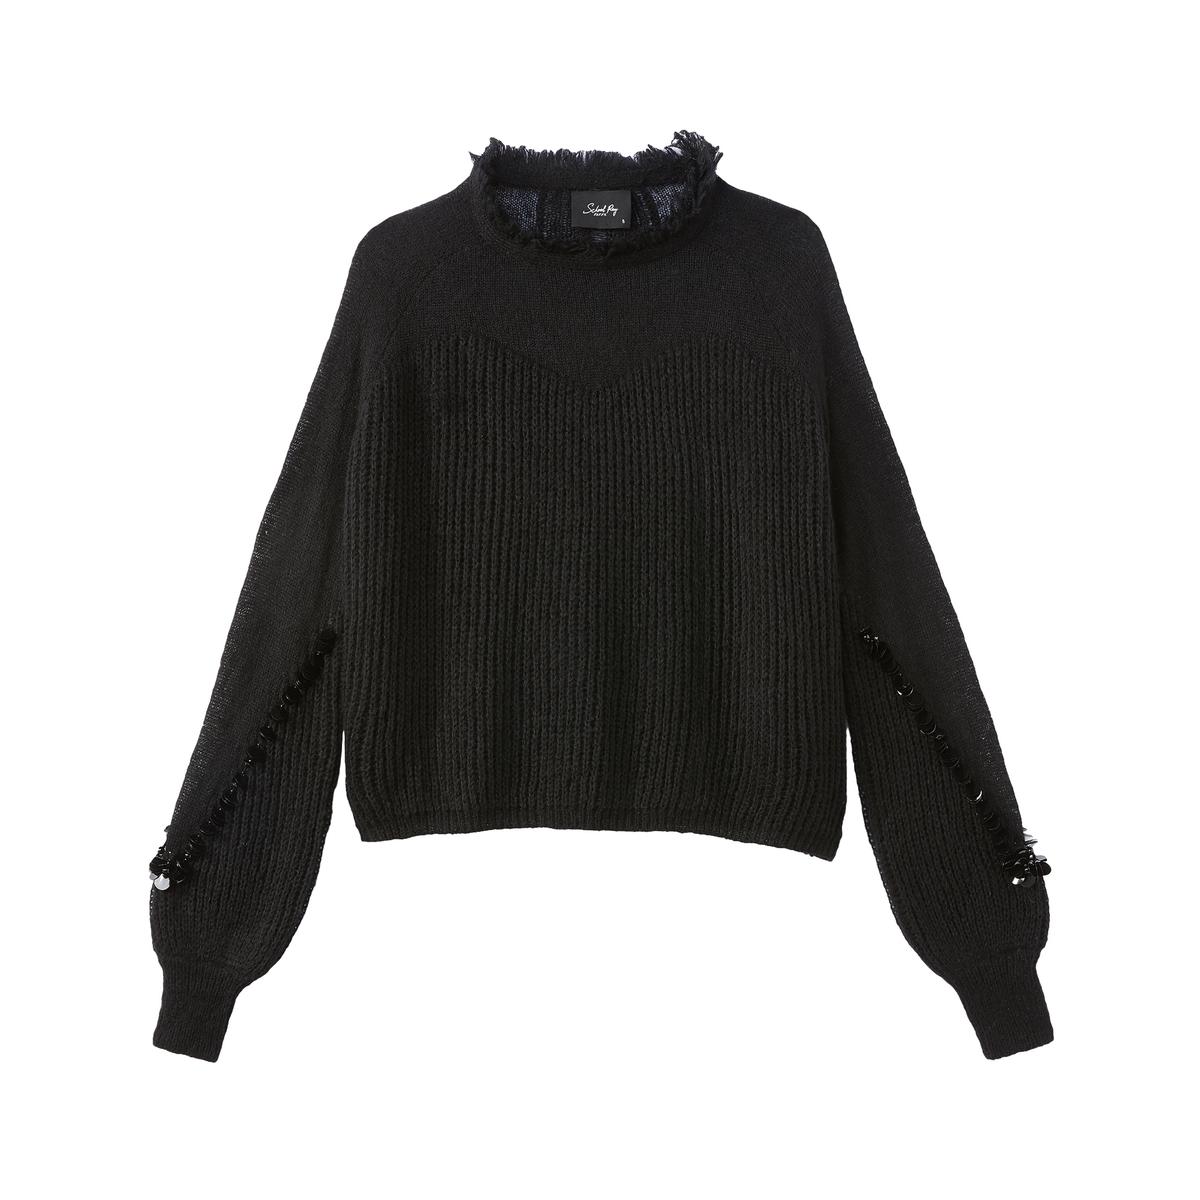 Пуловер SCHOOL RAG 15518562 от LaRedoute